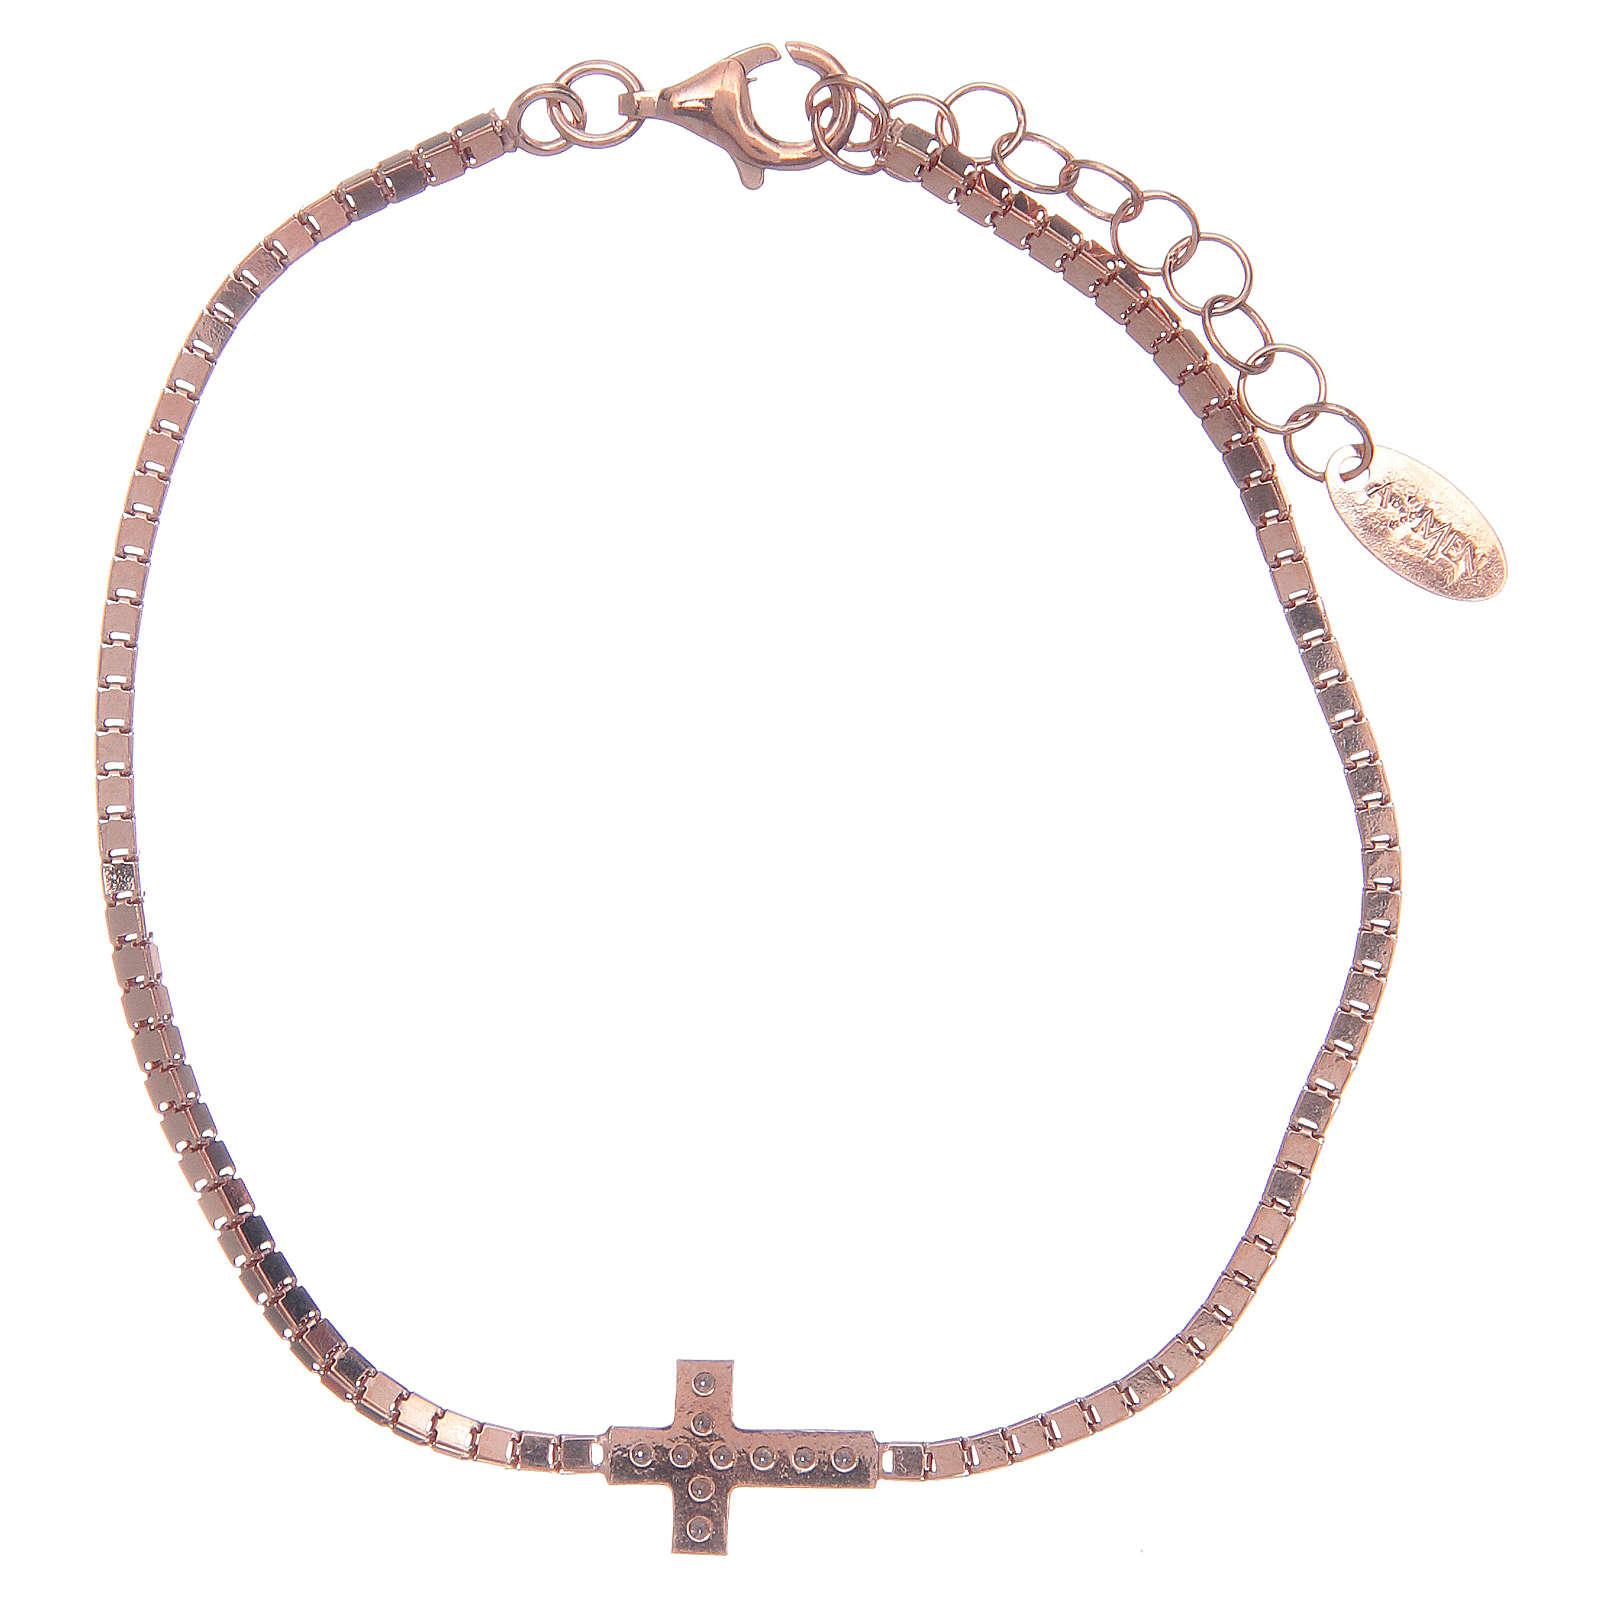 Bracciale Amen in Argento 925 Rosé croce 4